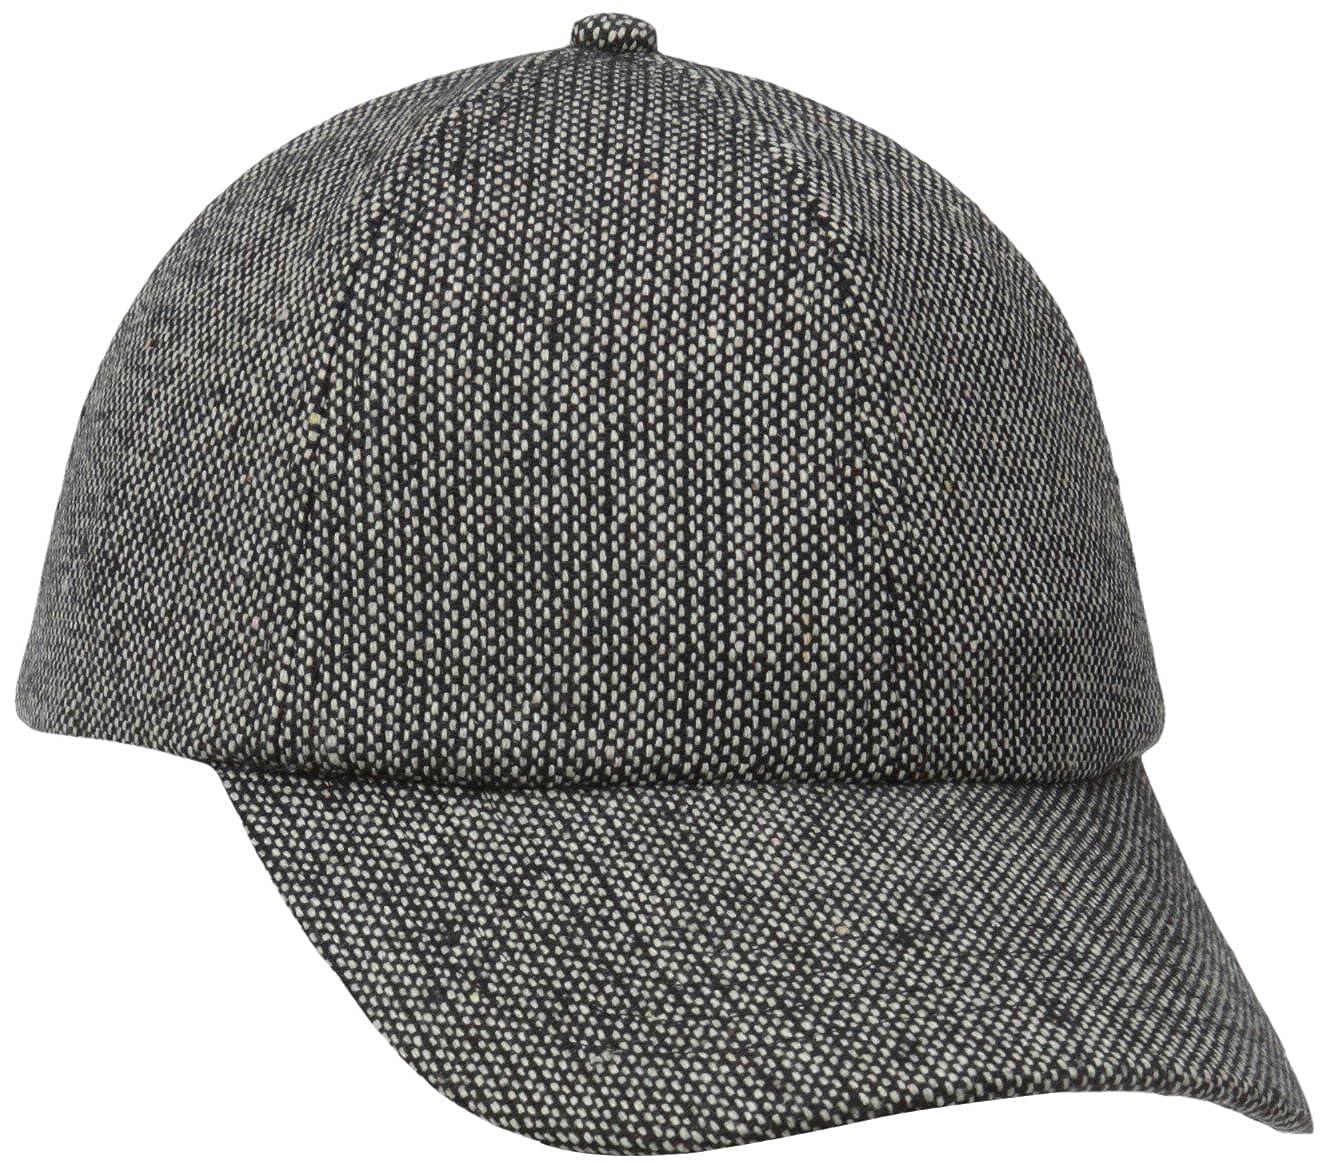 San Diego Hat Company Womens Tweed Cap Black One Size cth3702